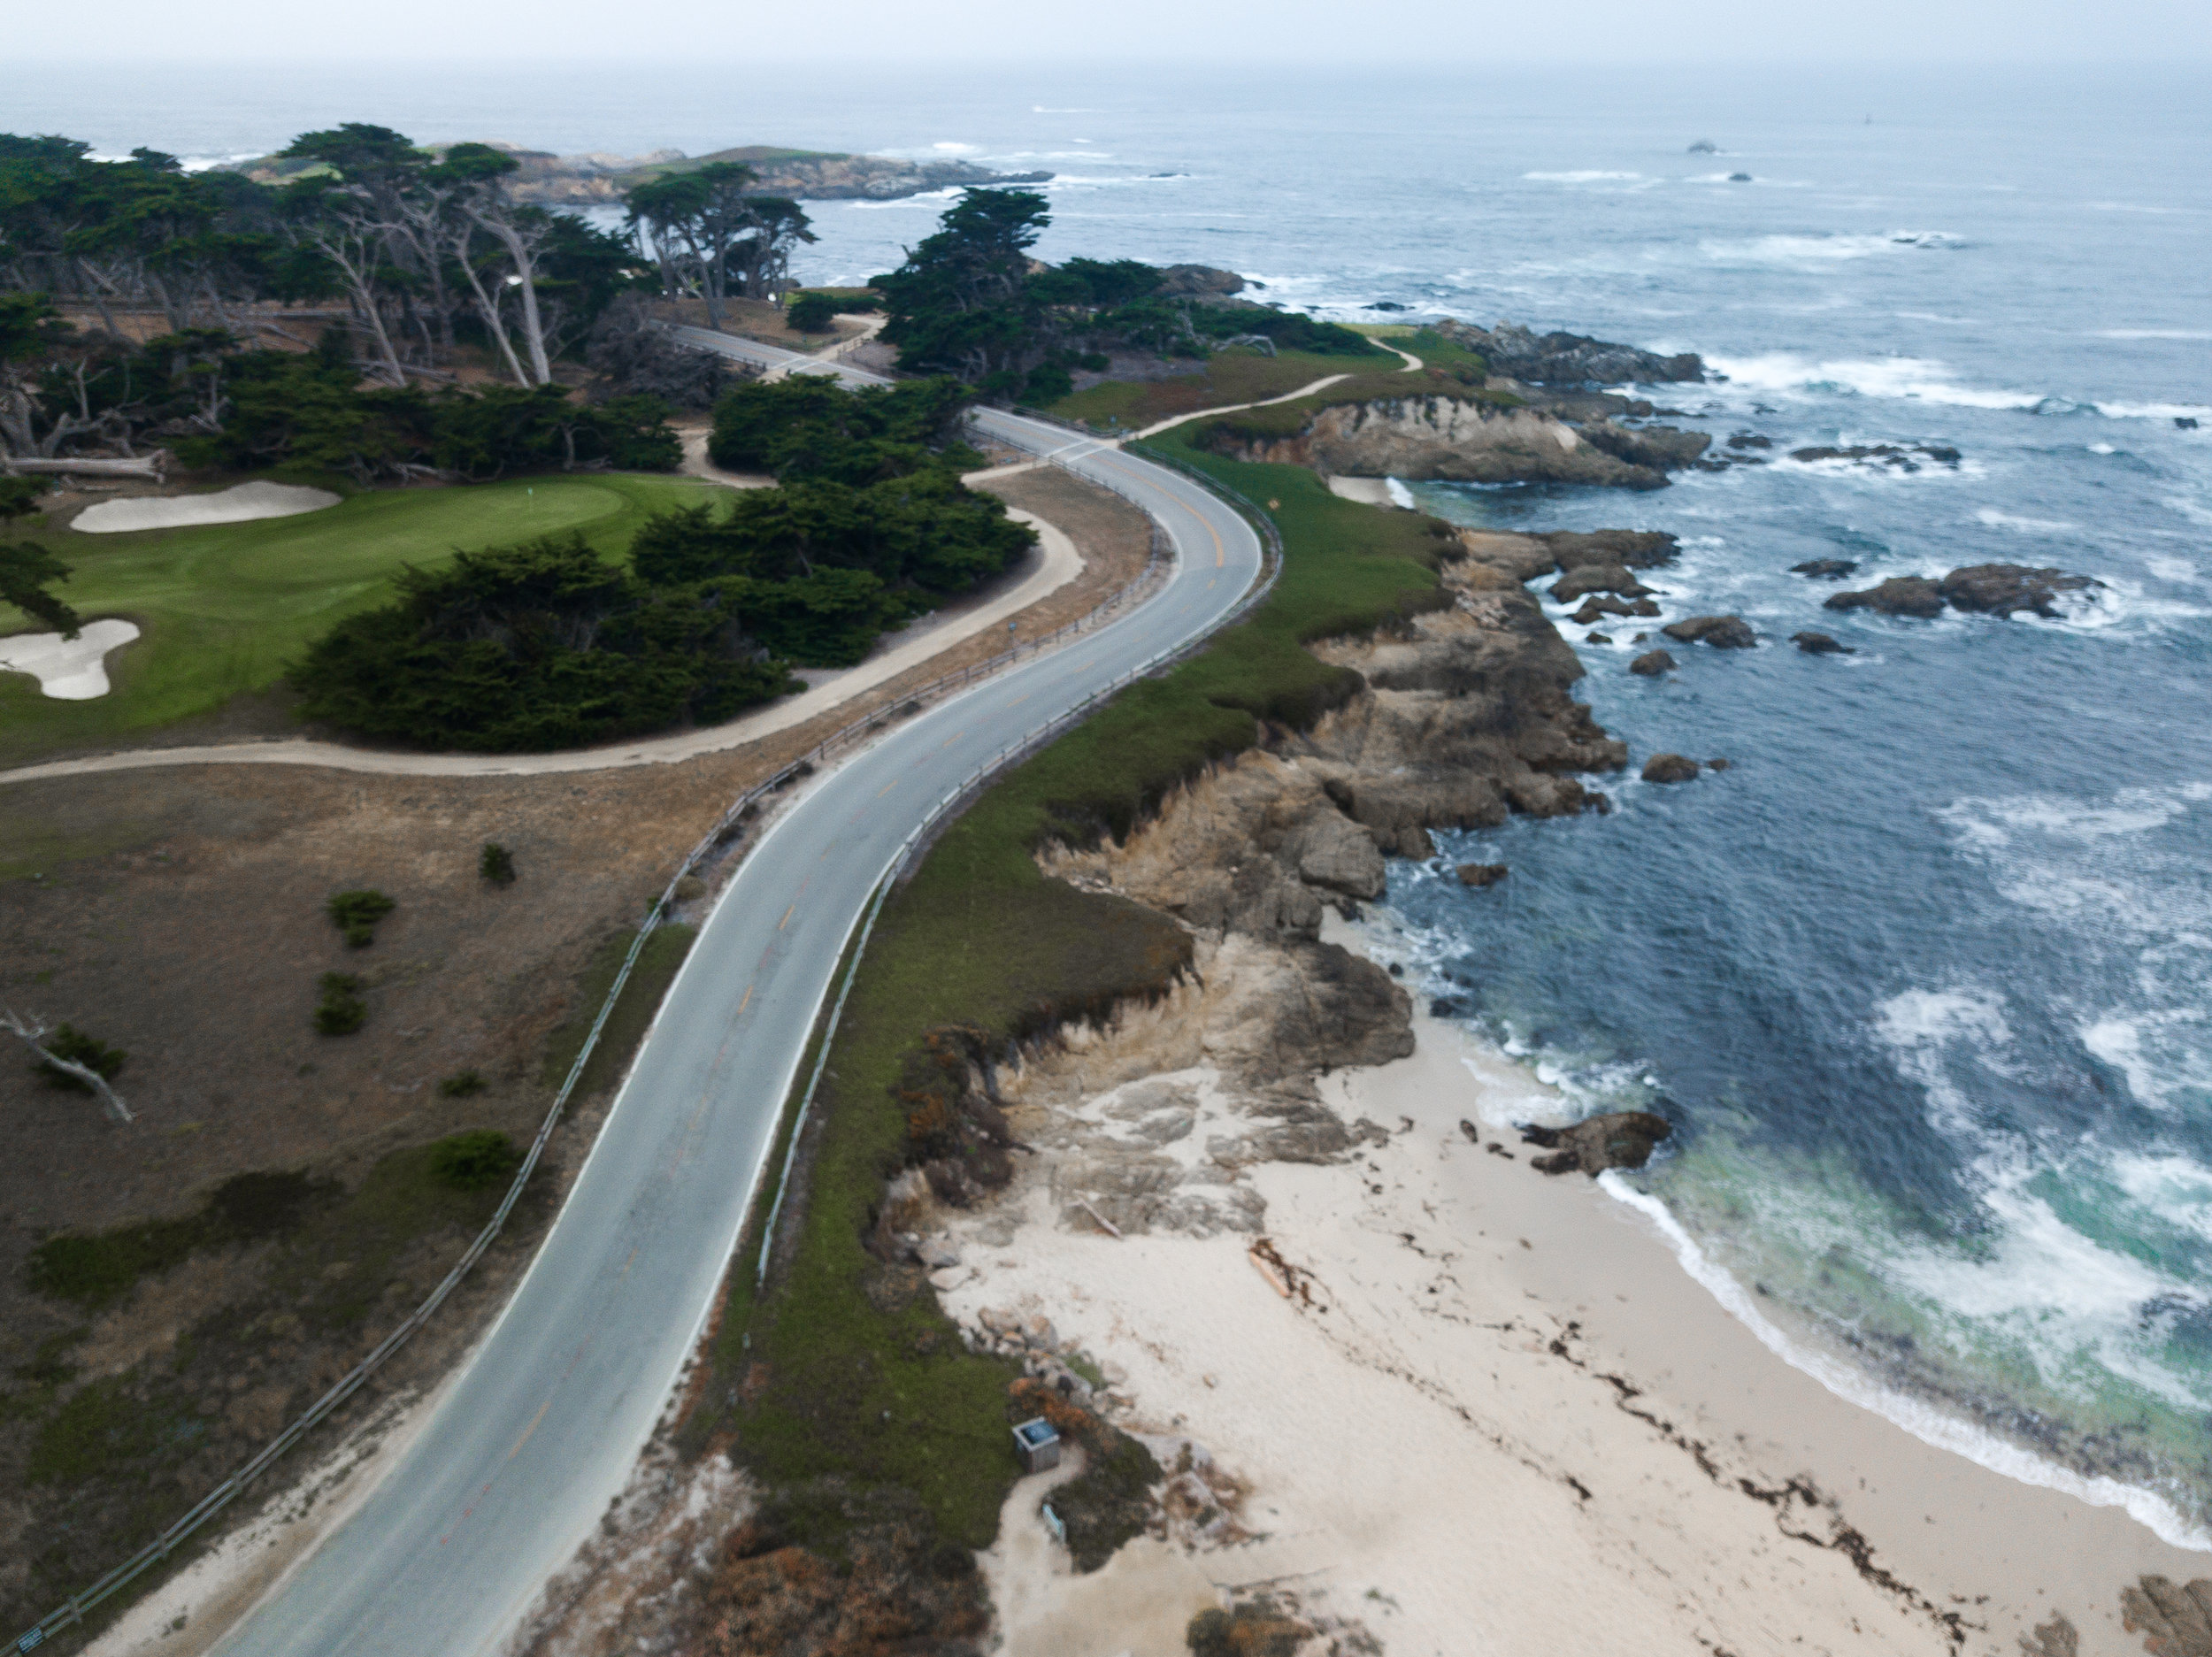 Stay_Driven_Monterey_Mclarens_DRONE-24.jpg